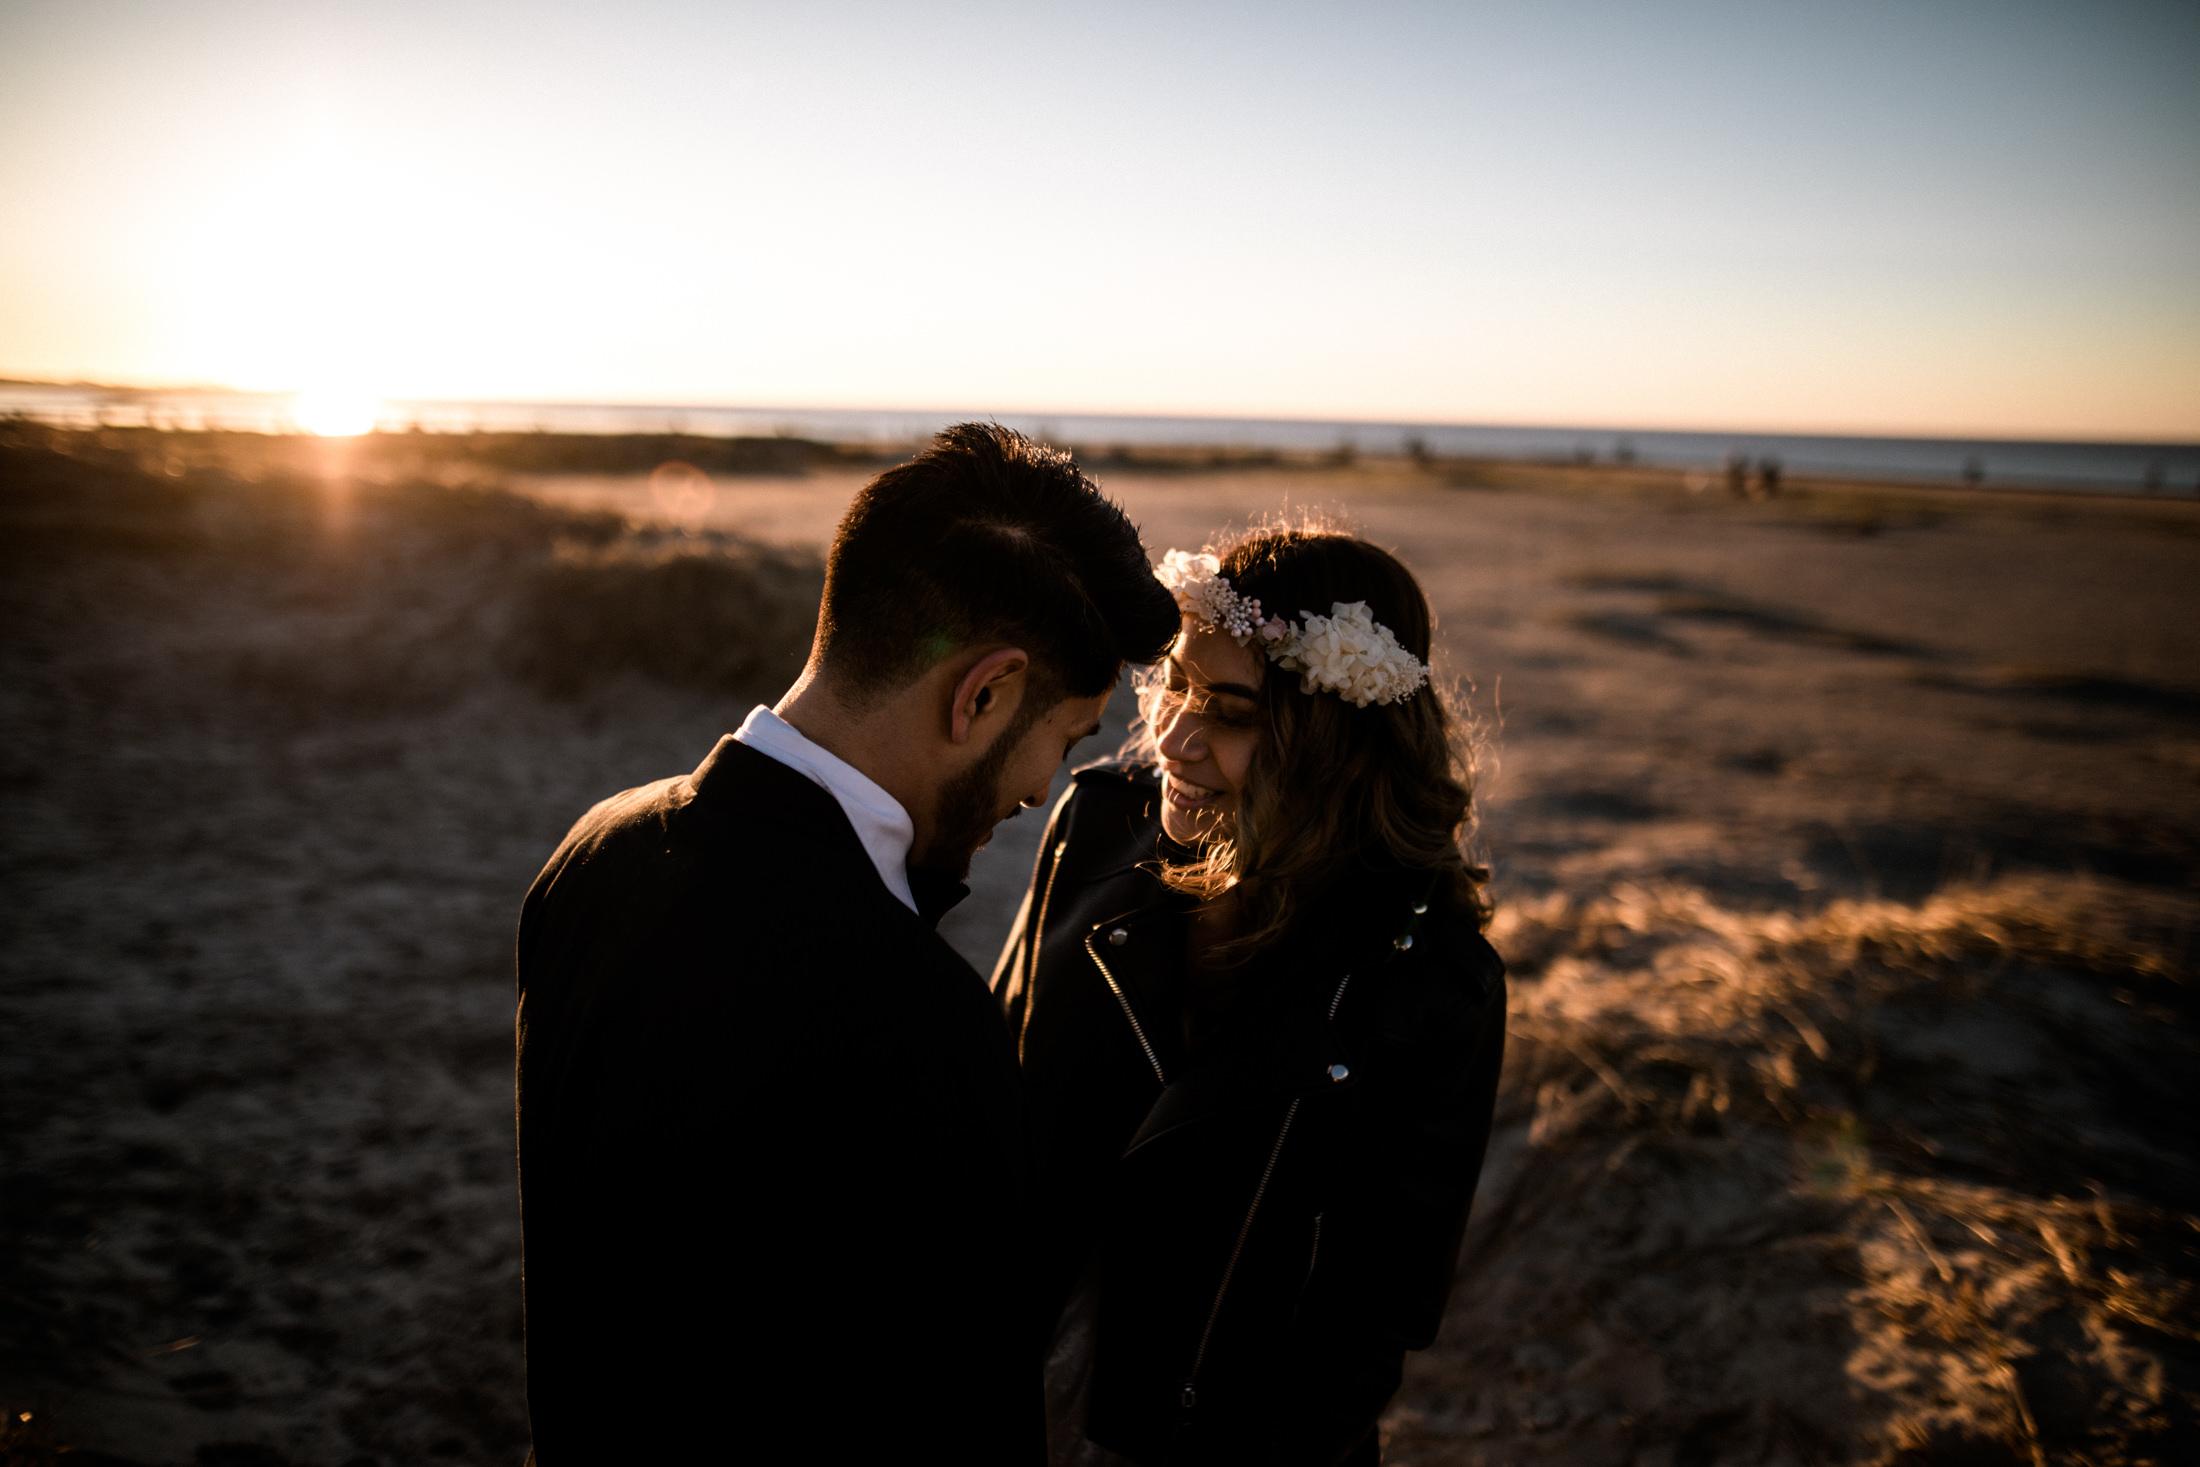 Wedding_Photographer_Mallorca_Daniela-Marquardt_Photography_CanaryIslands_Lanzarote_Iceland_Tuskany_Santorini_Portugal_Schweiz_Austria_Bayern_Elopement_Hochzeitsfotograf_Norddeichich_25